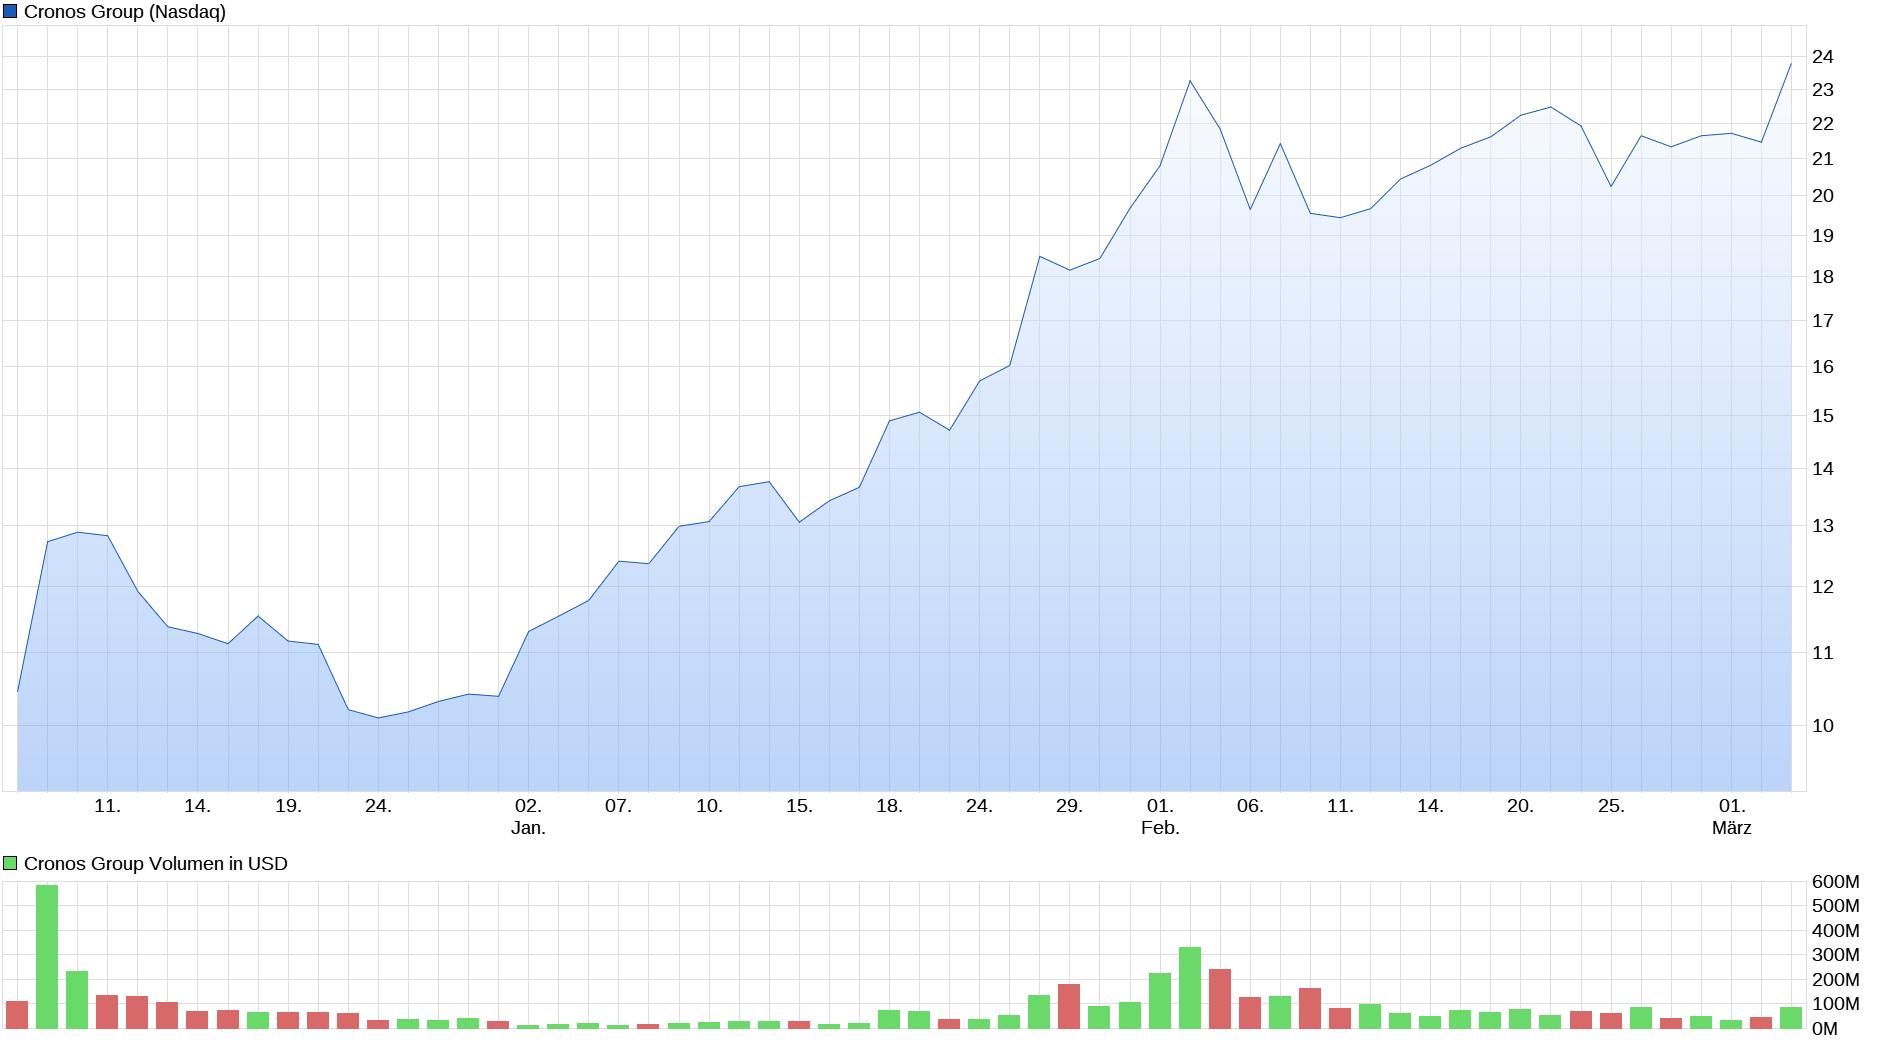 chart_quarter_cronosgroup.png